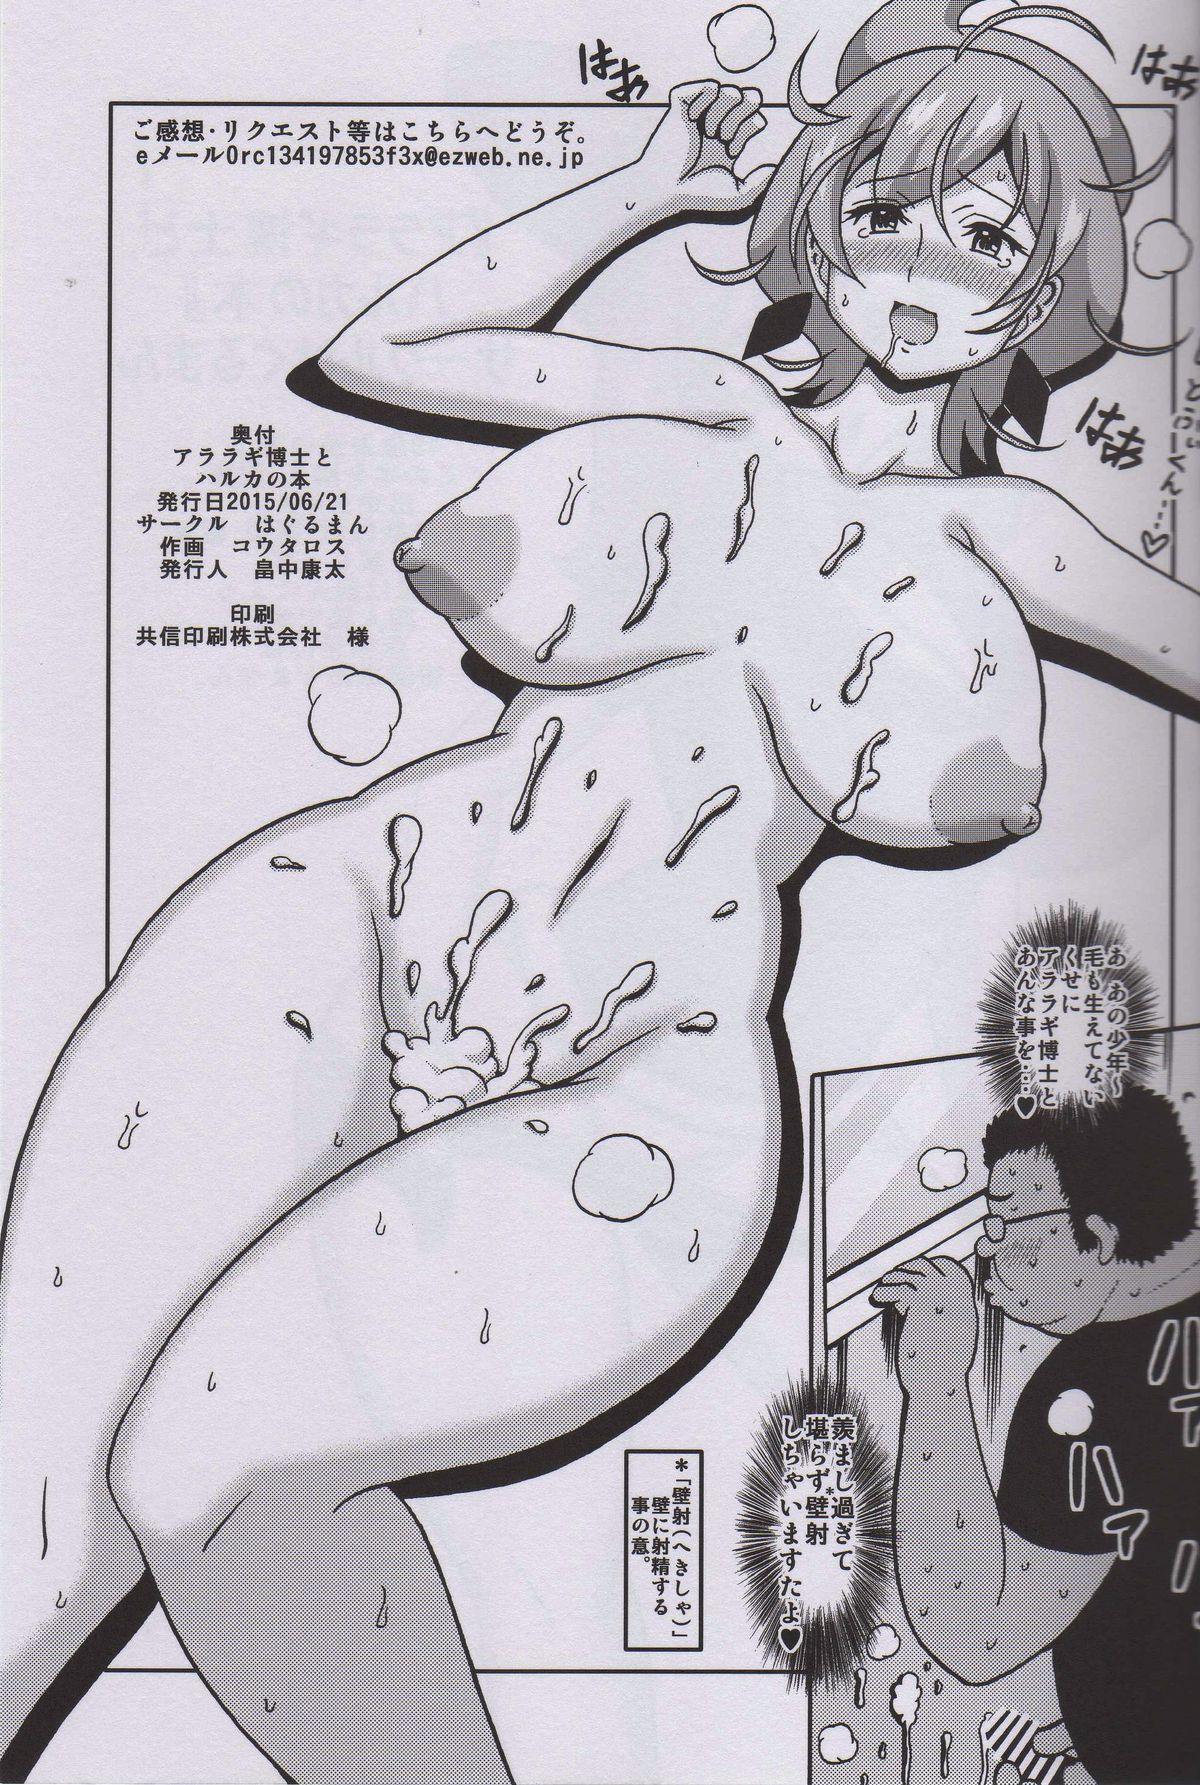 Araragi Hakase to Haruka no Hon 14